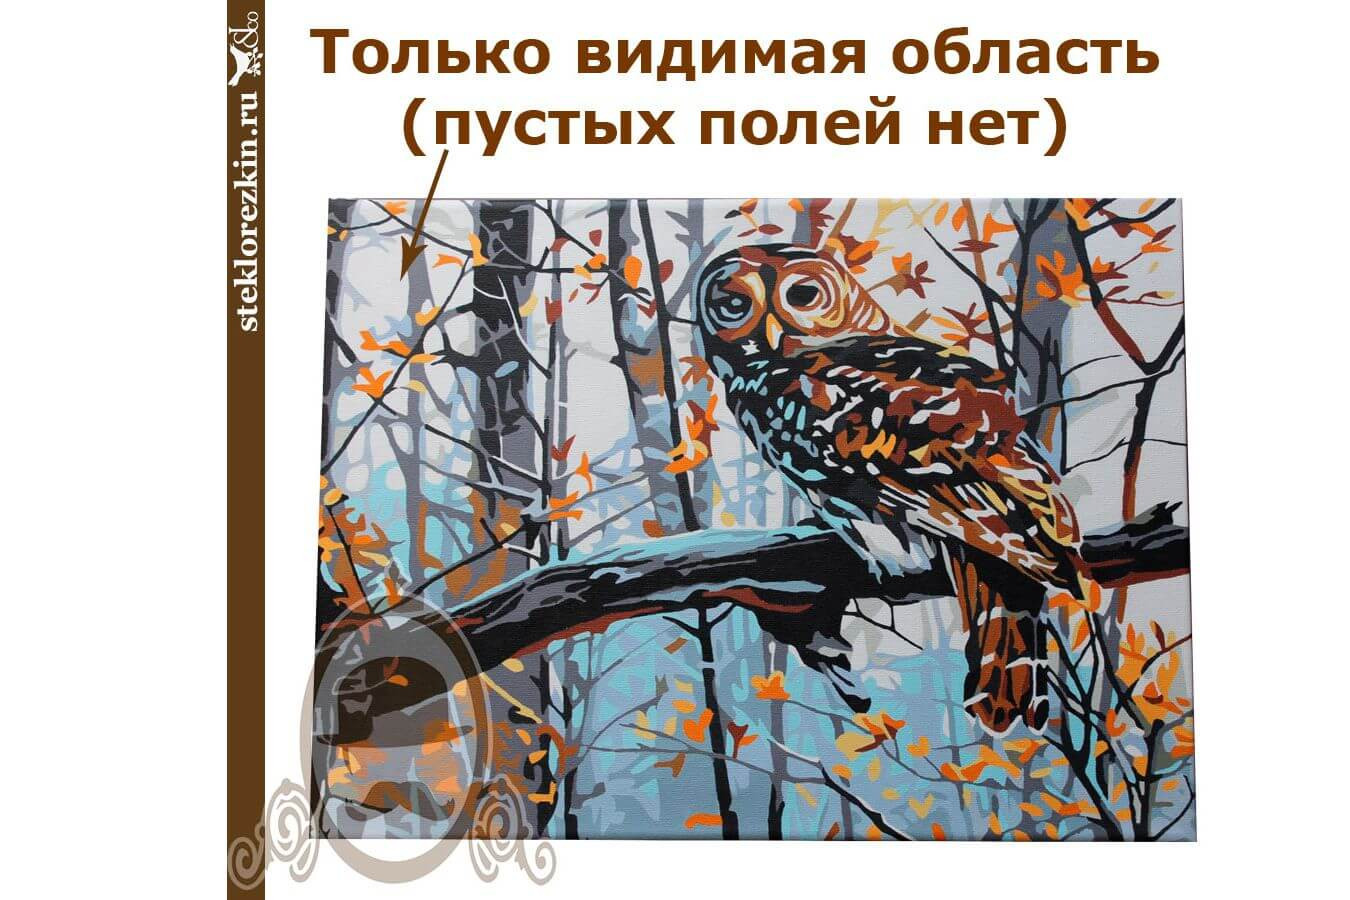 Baget_steklorezkin.ru_baget-zamer3.jpg